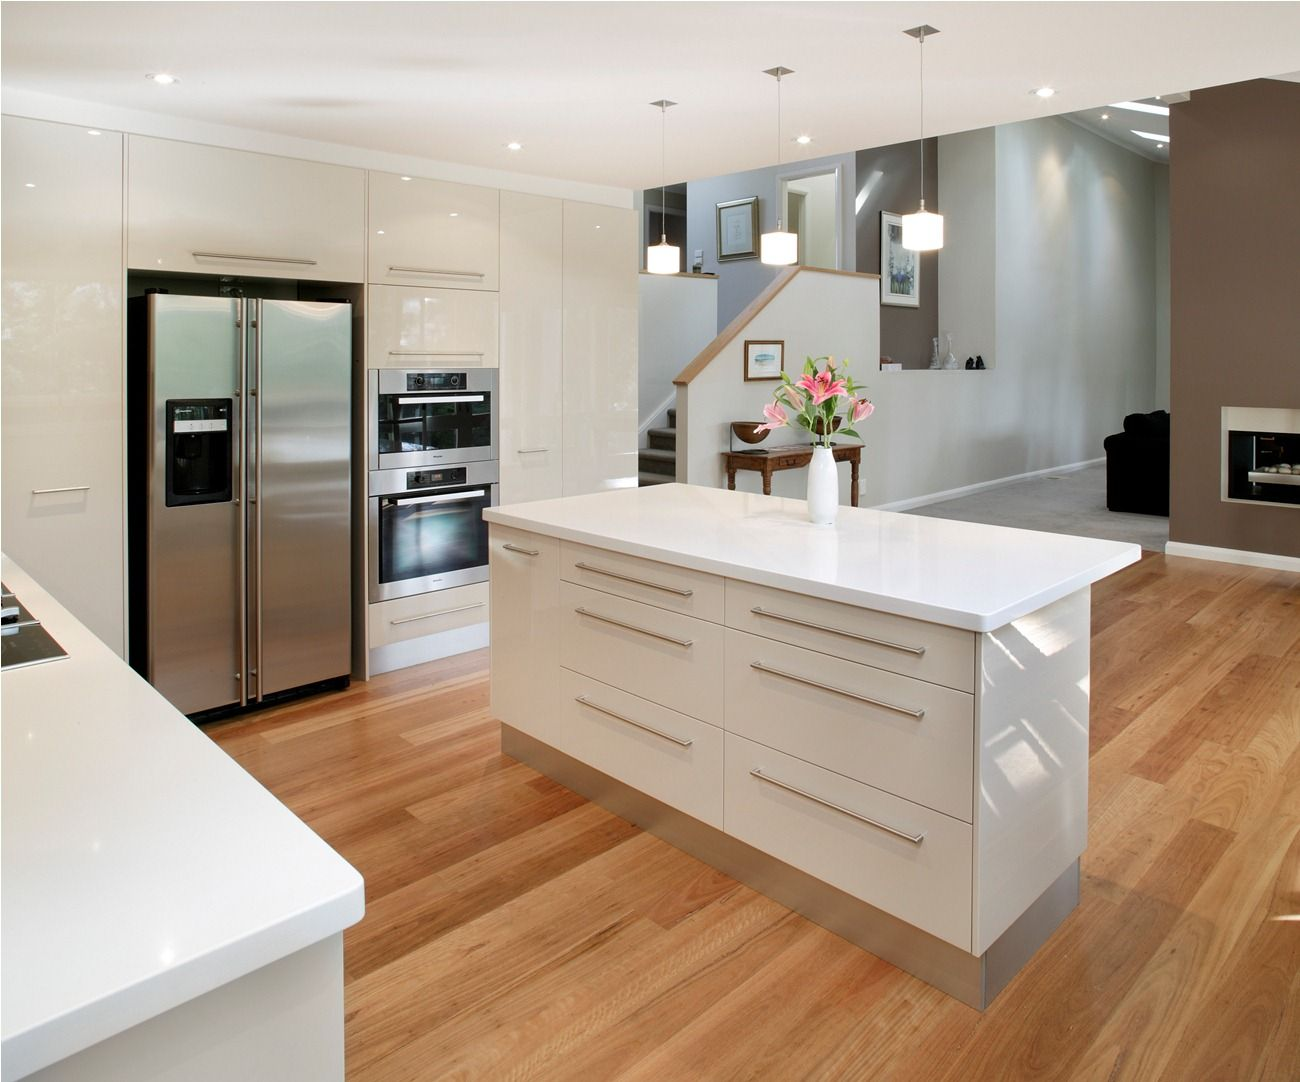 Kitchen Design Win At The Hills Design Awards Kuchen Design Moderne Kuche Kuchen Design Ideen